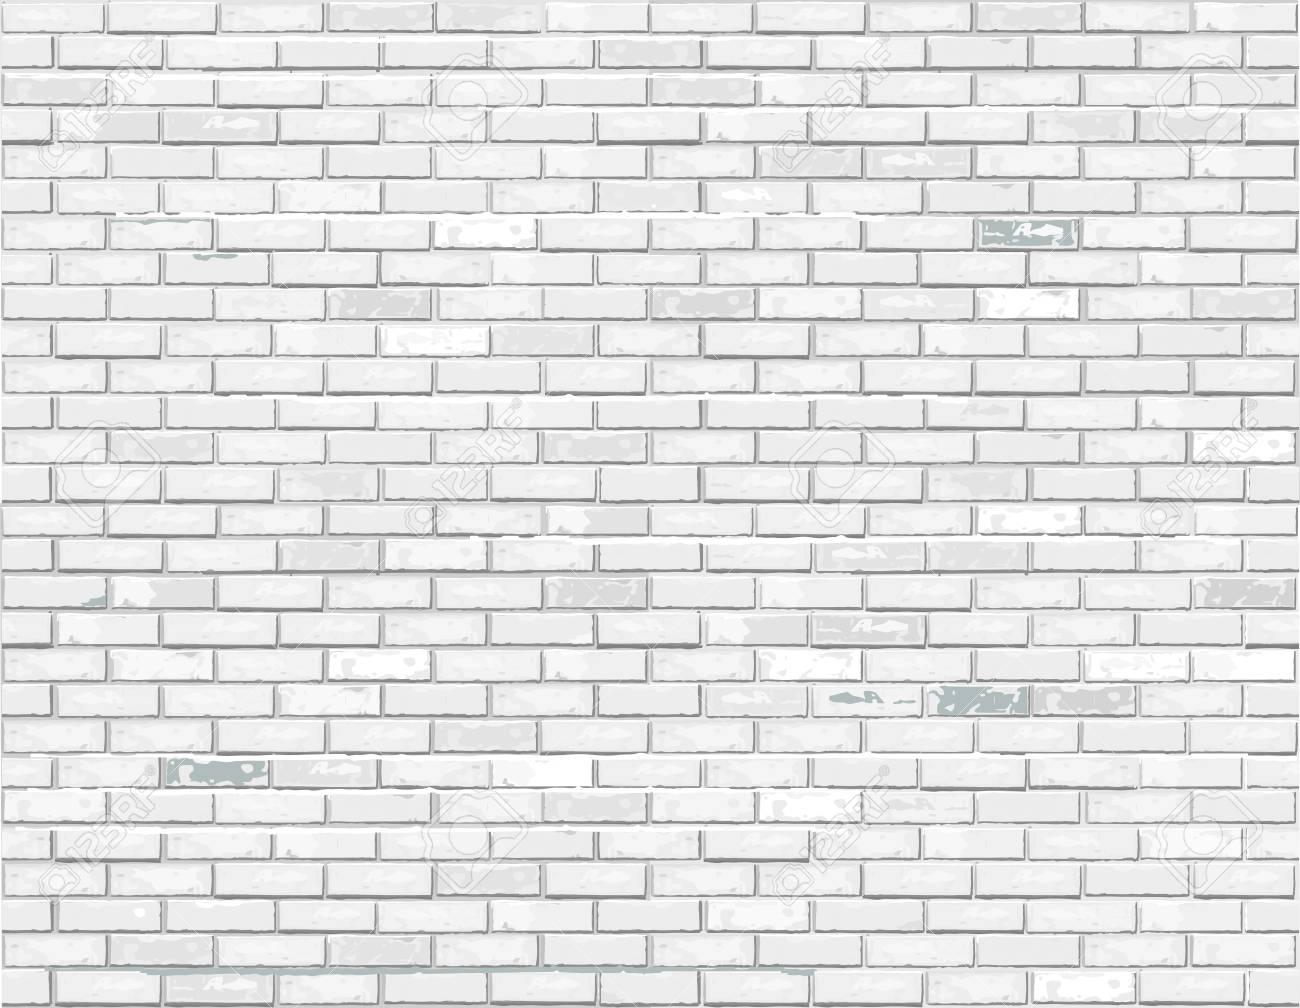 White brick background illustration. - 100212589